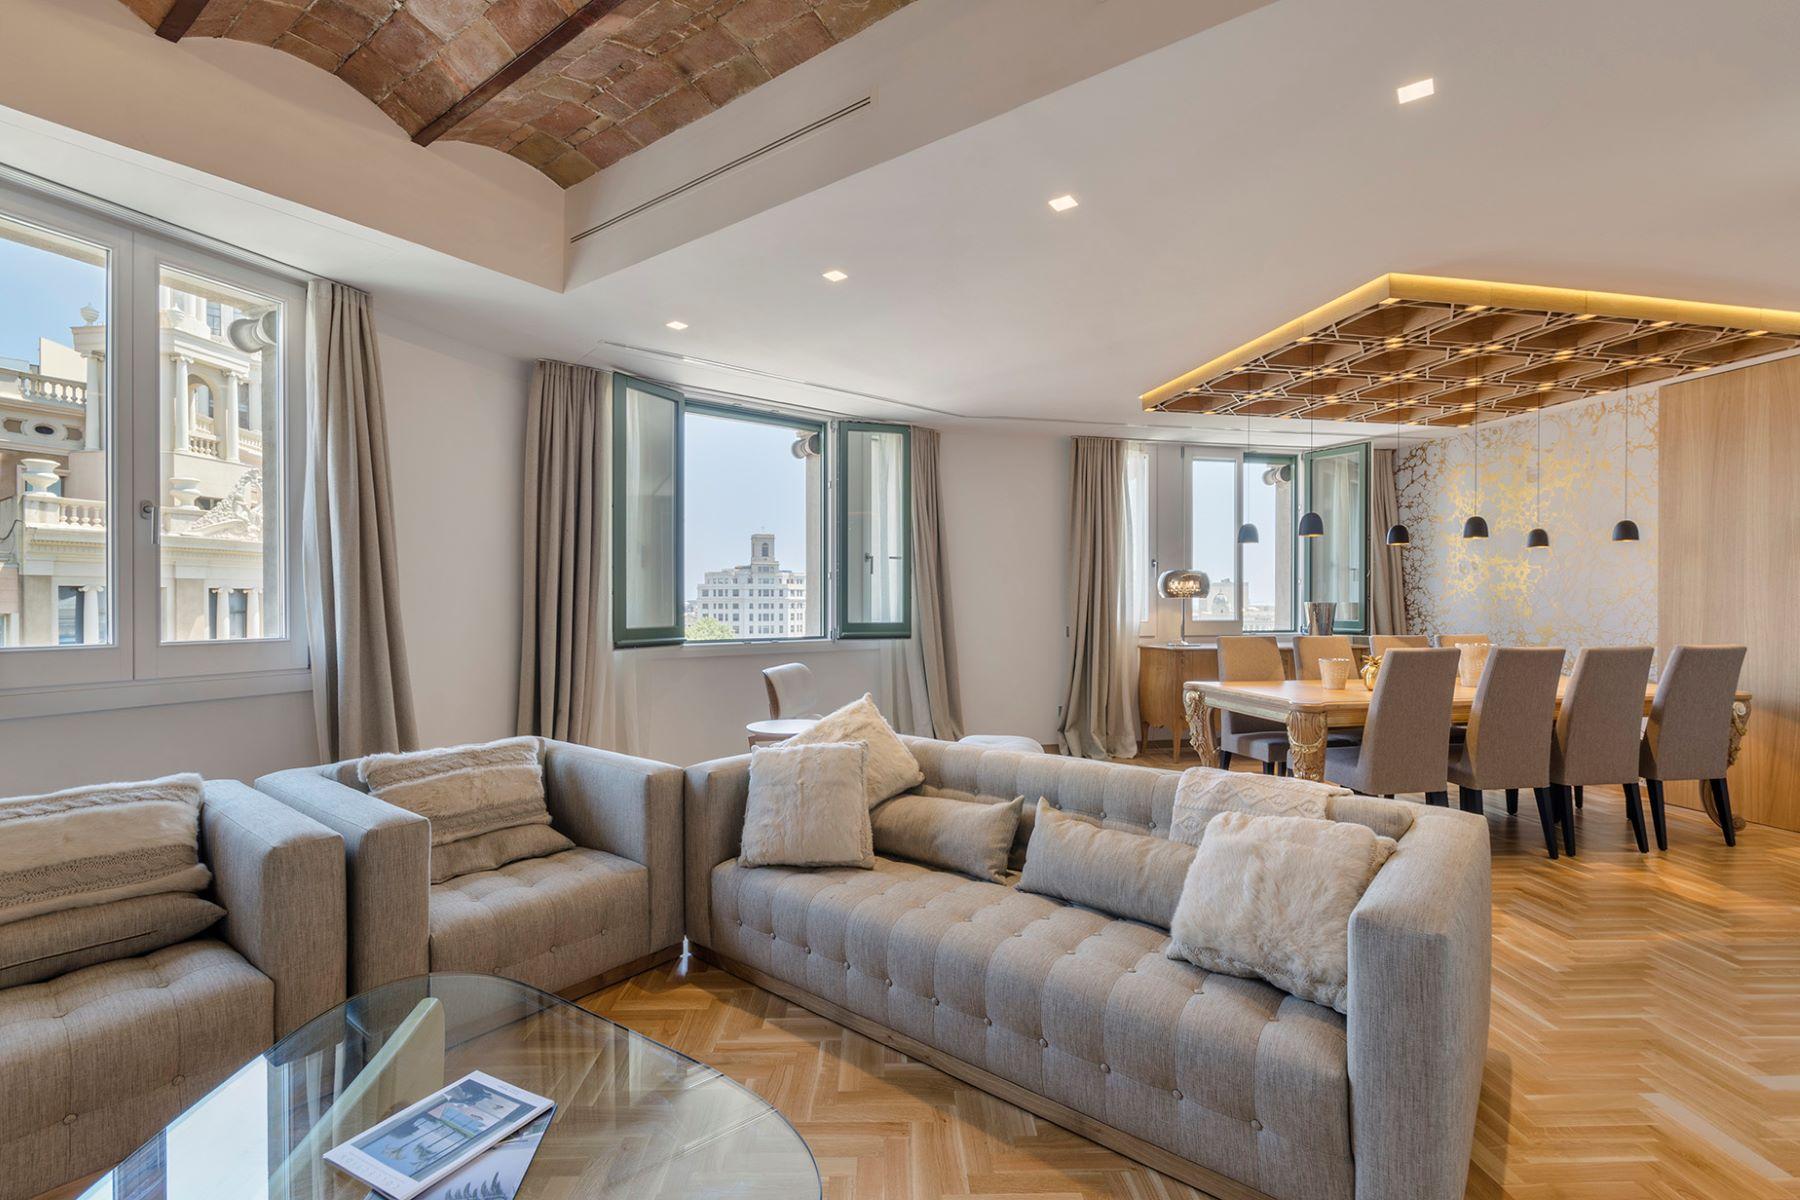 公寓 为 销售 在 Luxury apartment with unique views in the heart of Barcelona 巴萨罗纳城, 巴塞罗那, 08007 西班牙